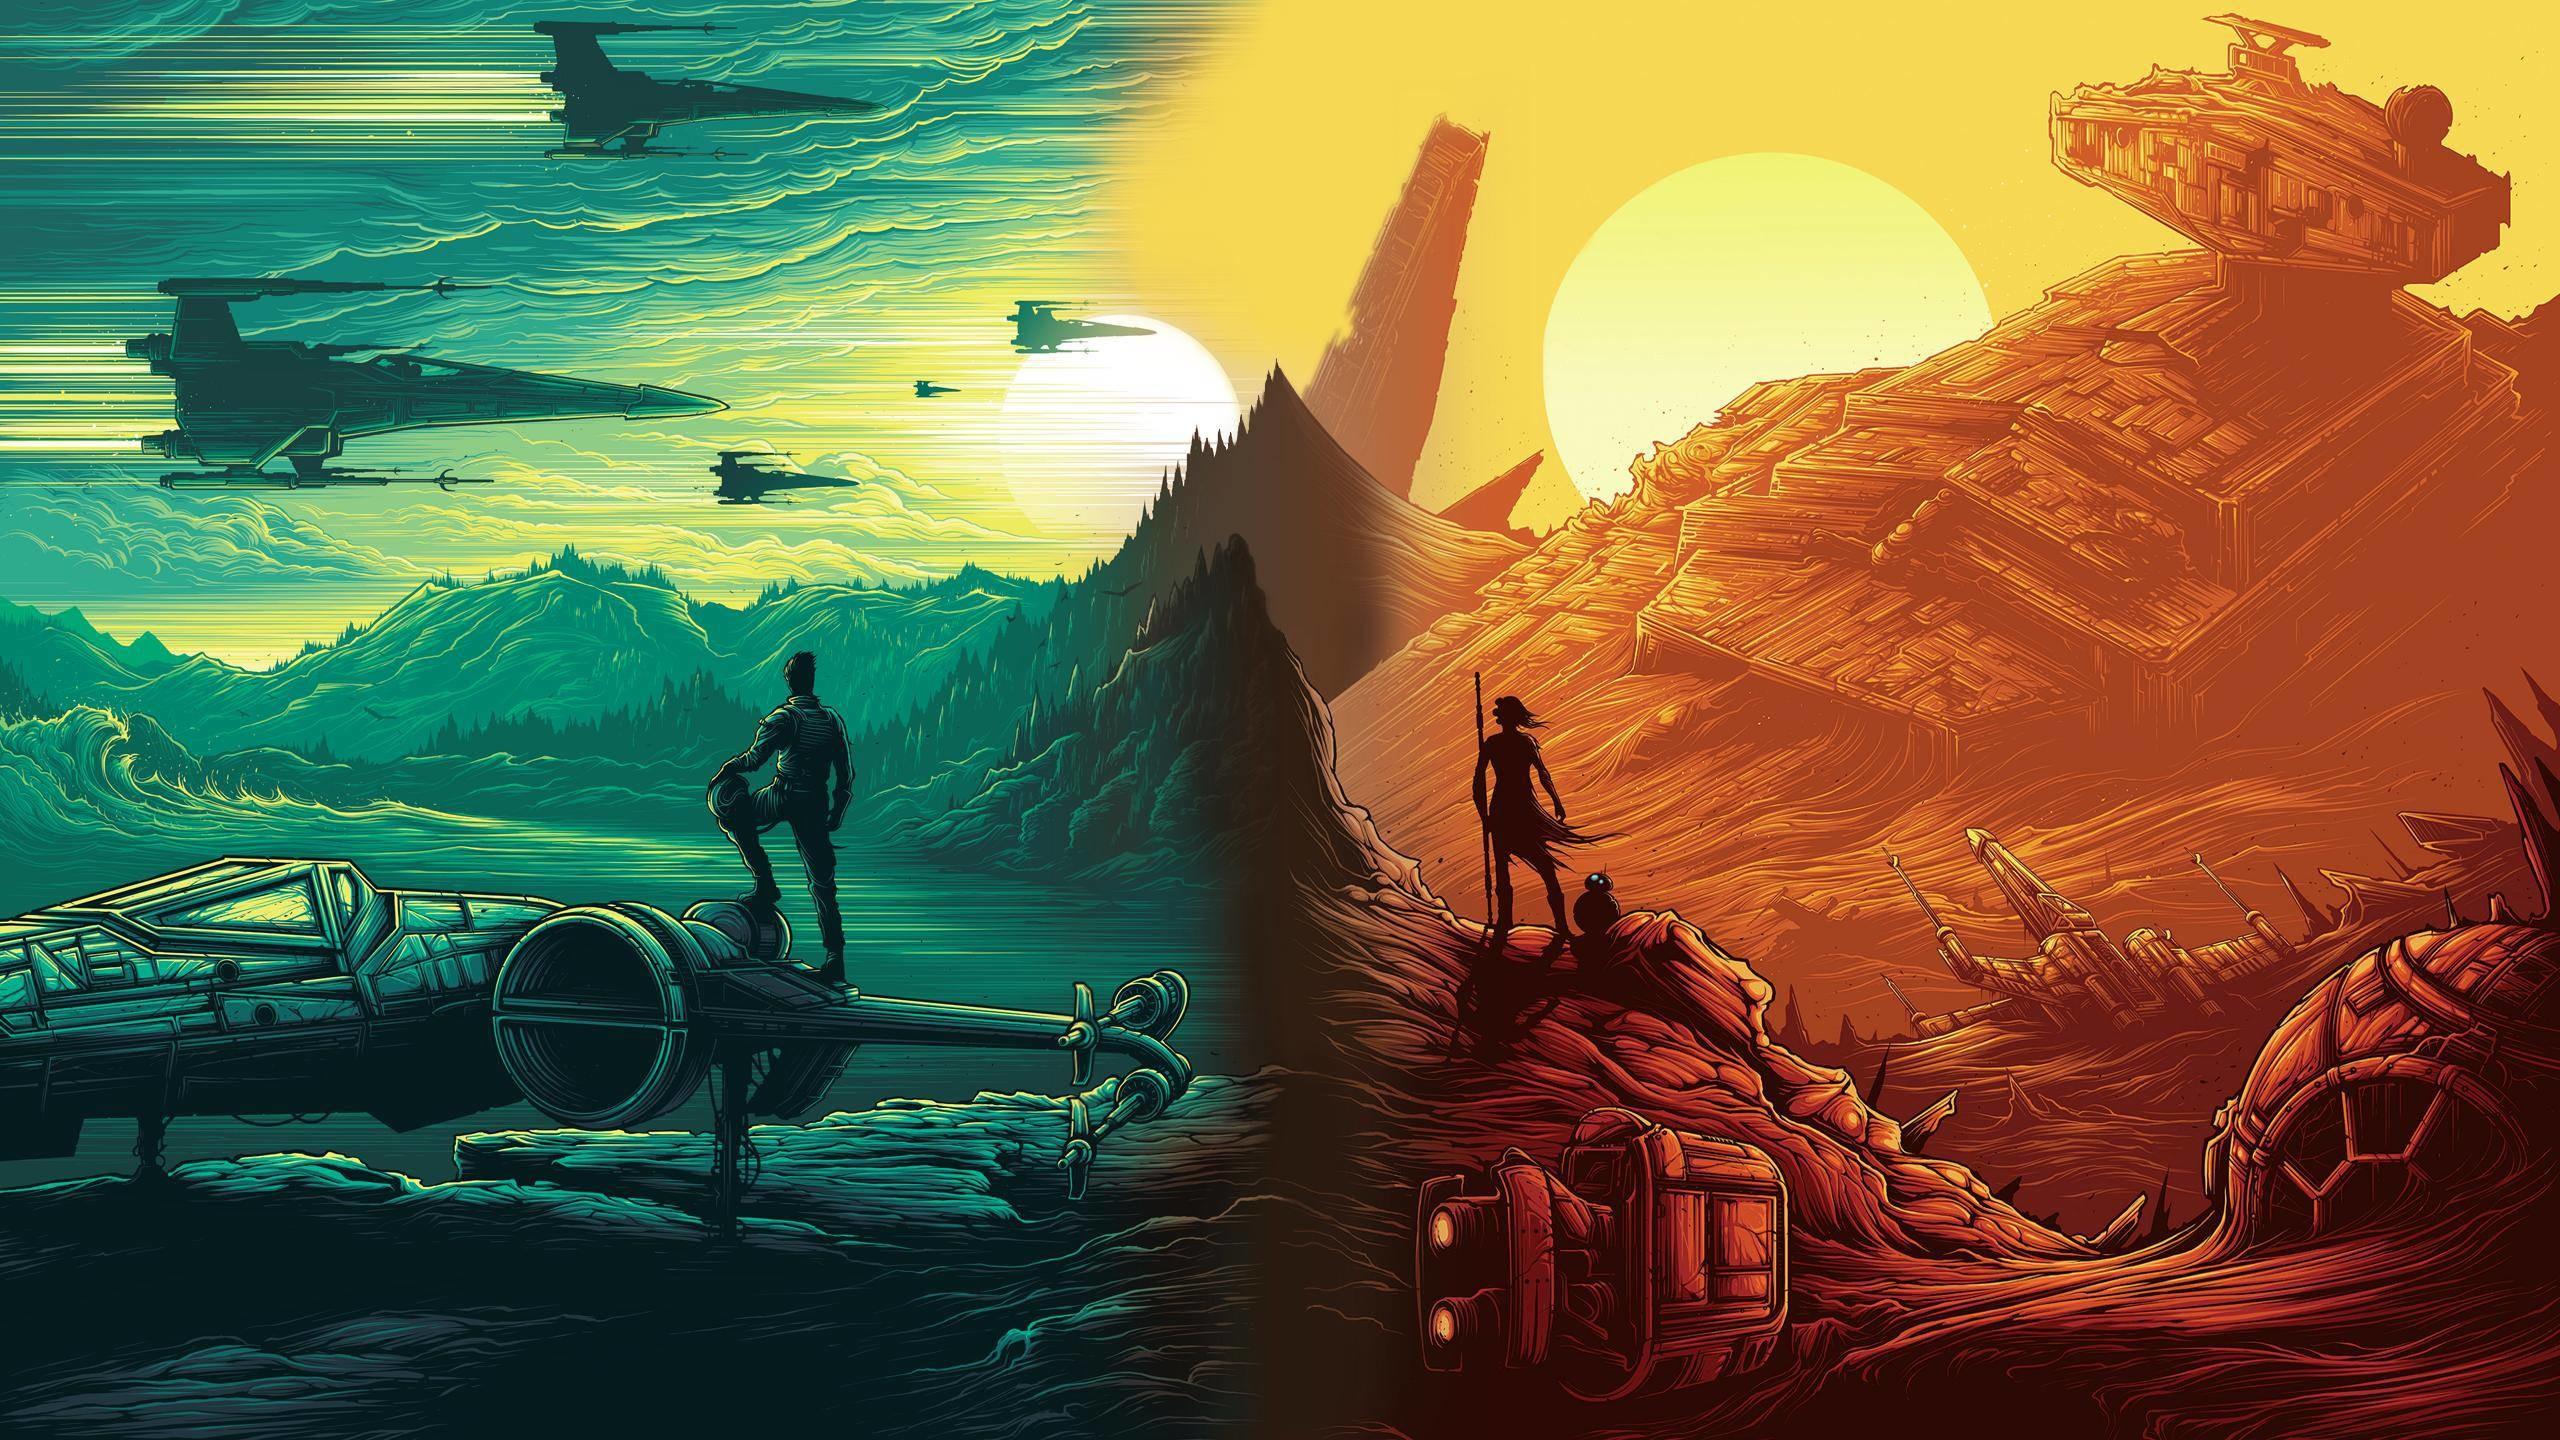 Star Wars HD Wallpapers Backgrounds Wallpaper 2560×1440 Star Wars Wallpaper  (36 Wallpapers)